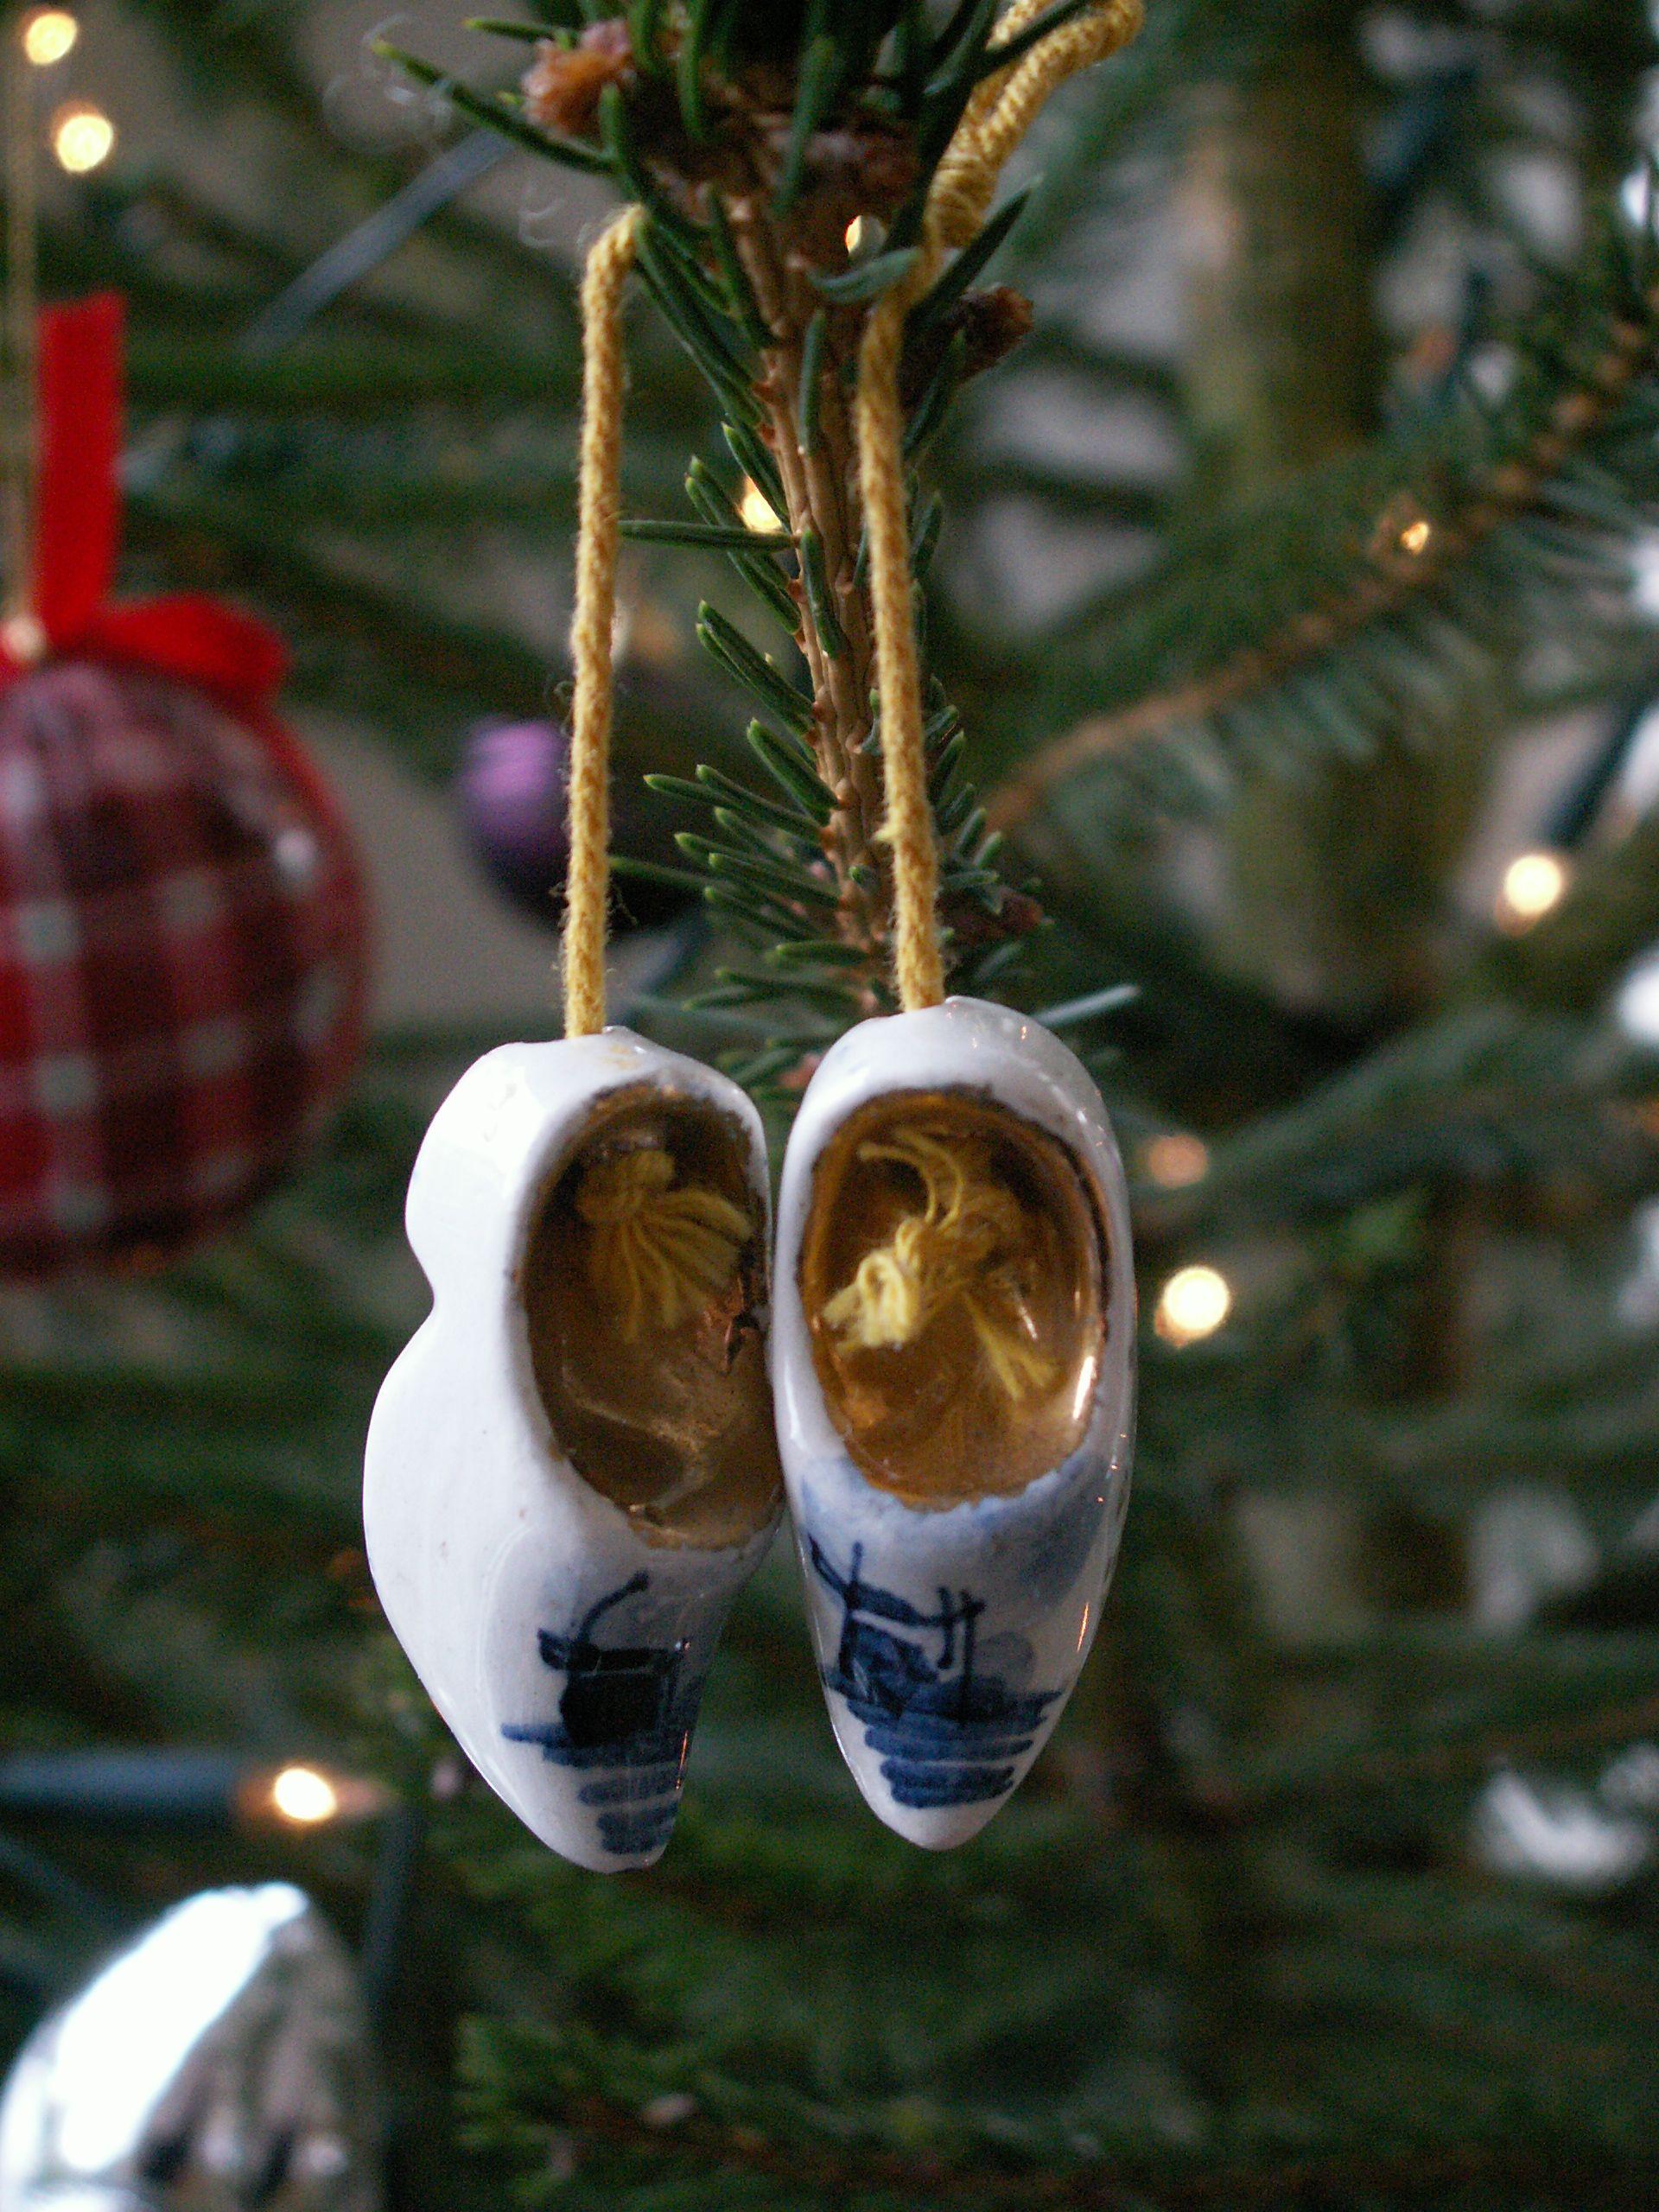 Dutch Christmas Ornaments | Cards | Pinterest | Christmas, Christmas ...